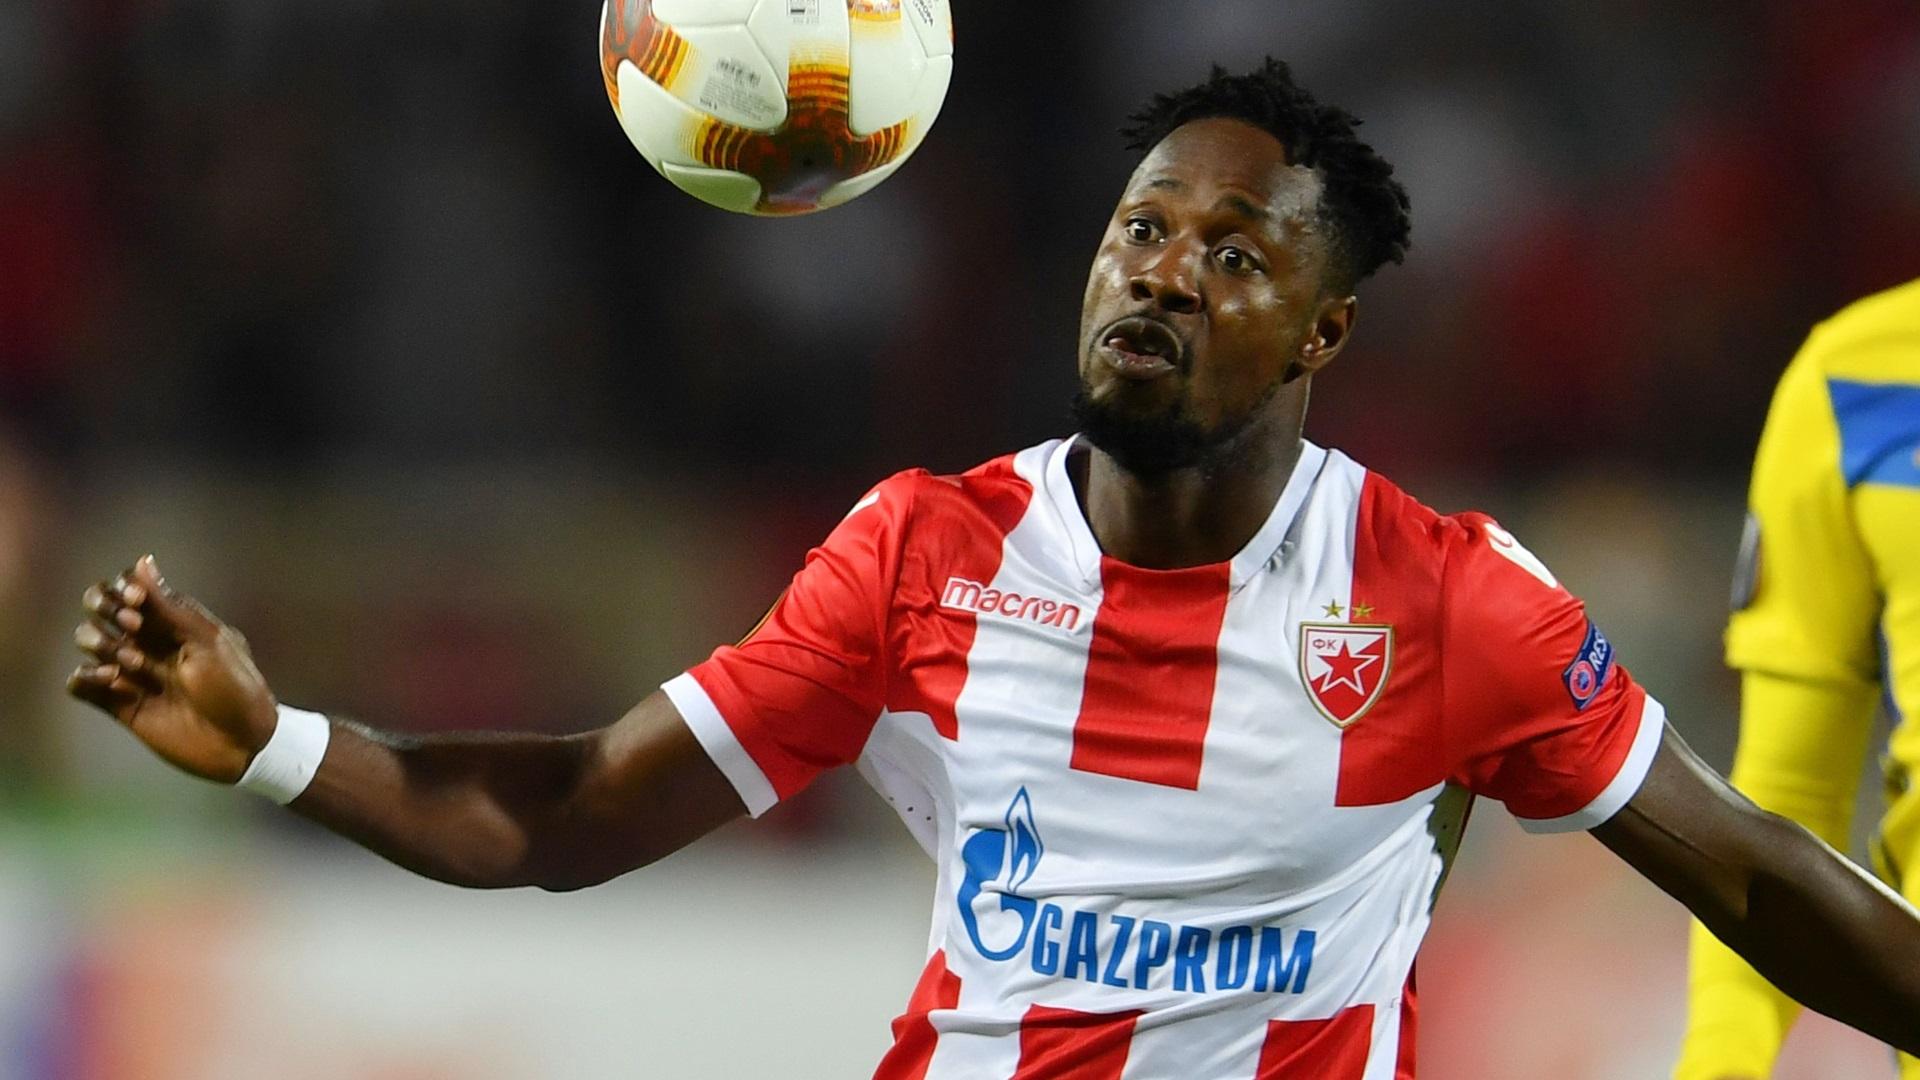 Richmond Boakye of Red Star Belgrade